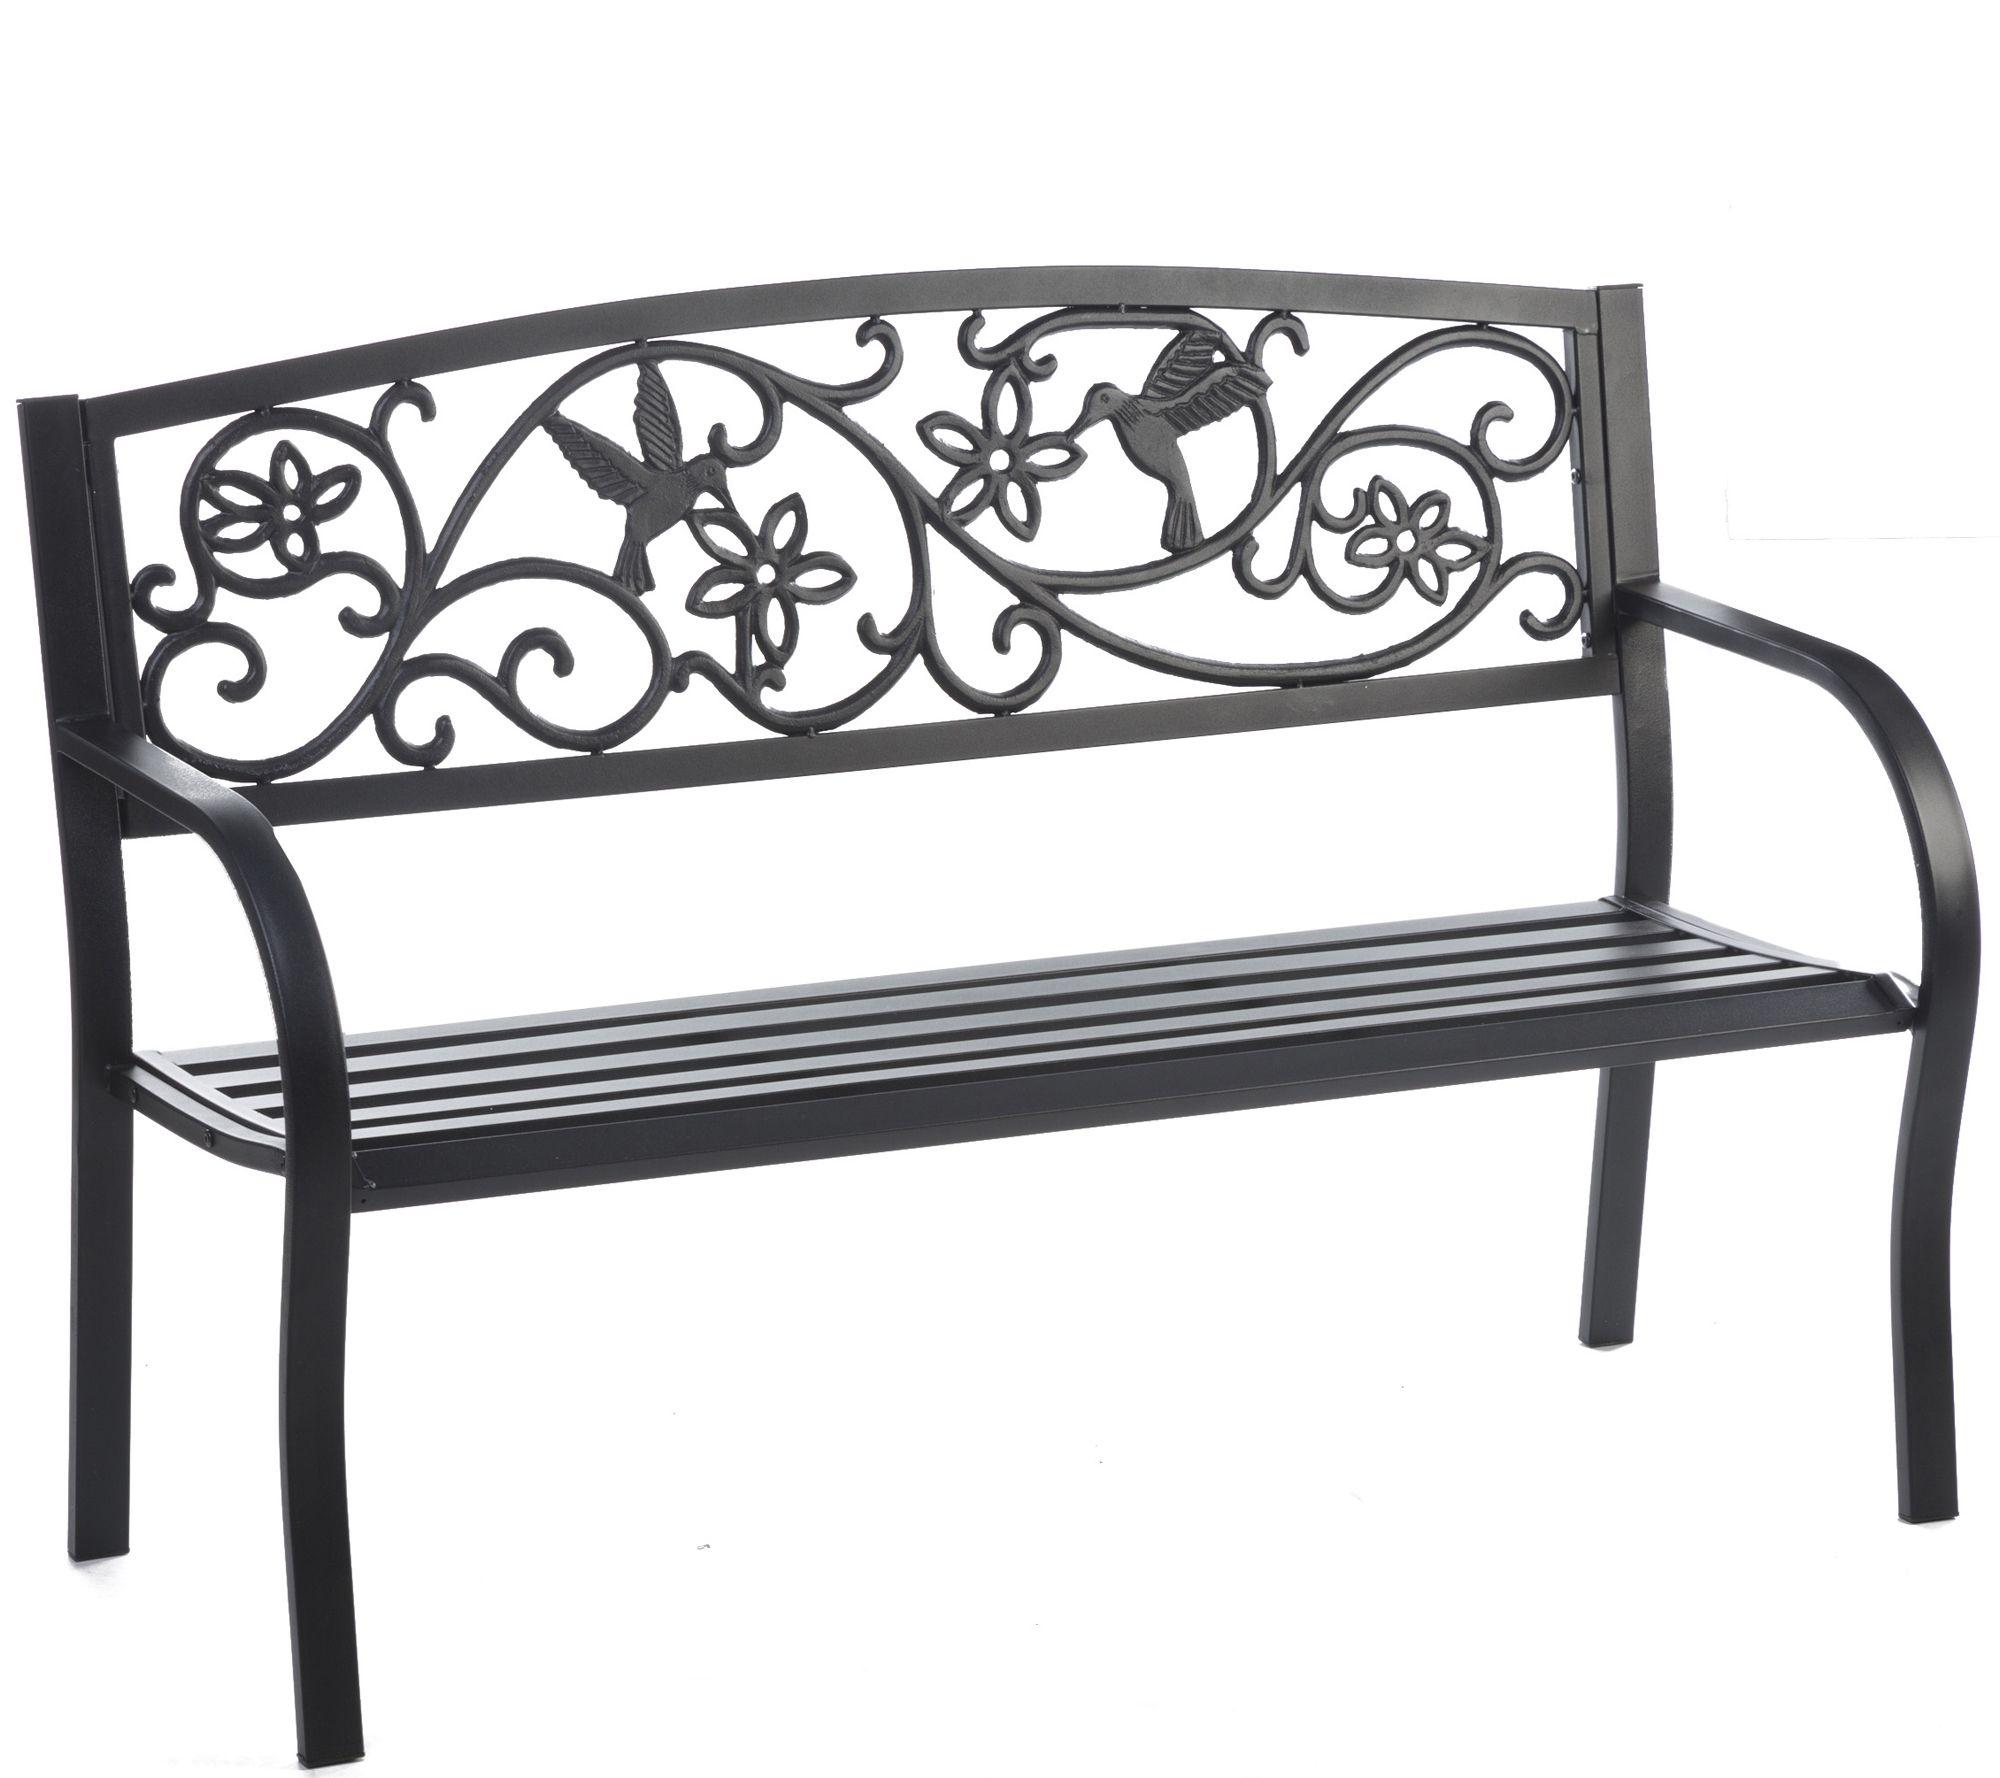 Beau ... Hummingbird Metal Garden Bench. Product Thumbnail. In Stock